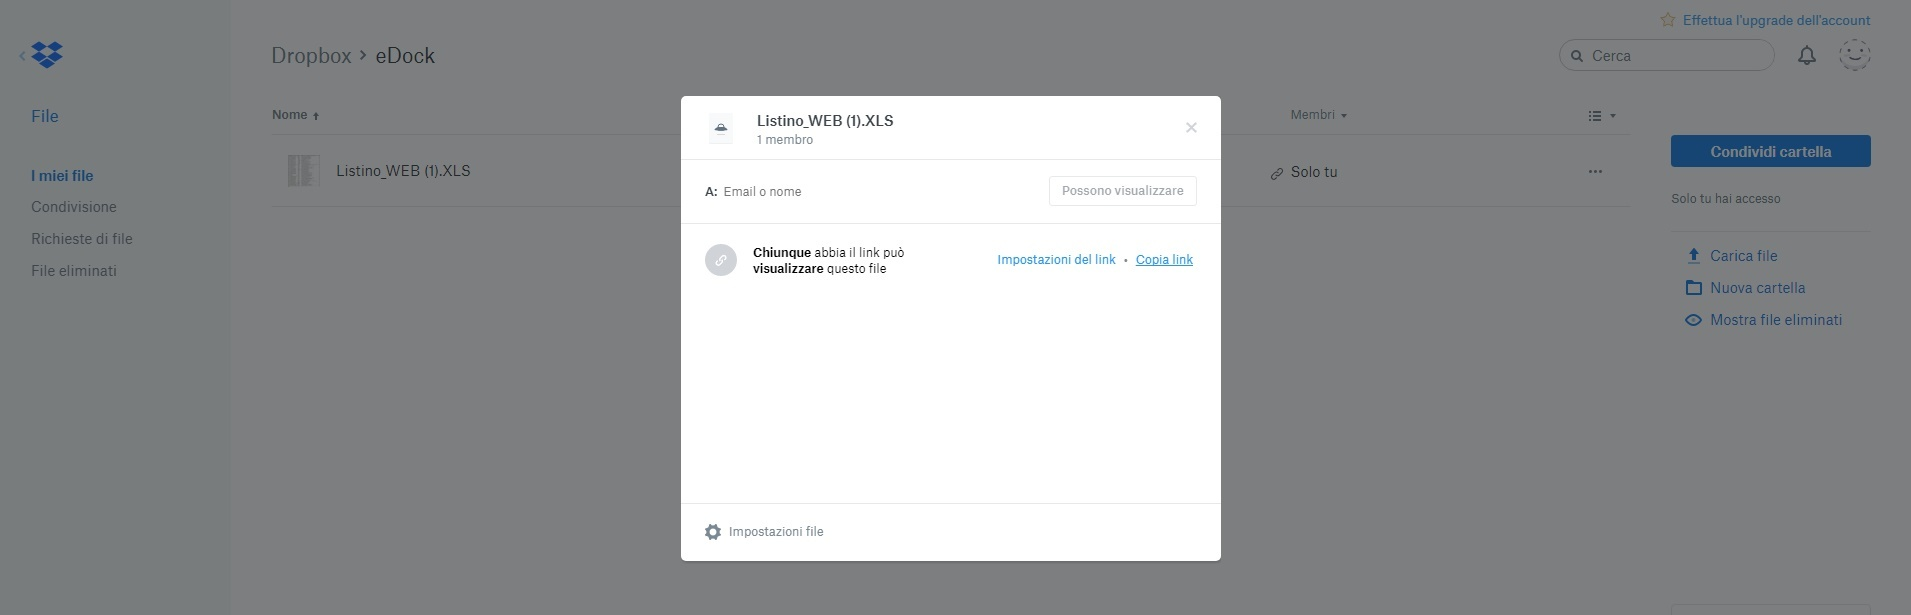 per_manuale_dropbox_2